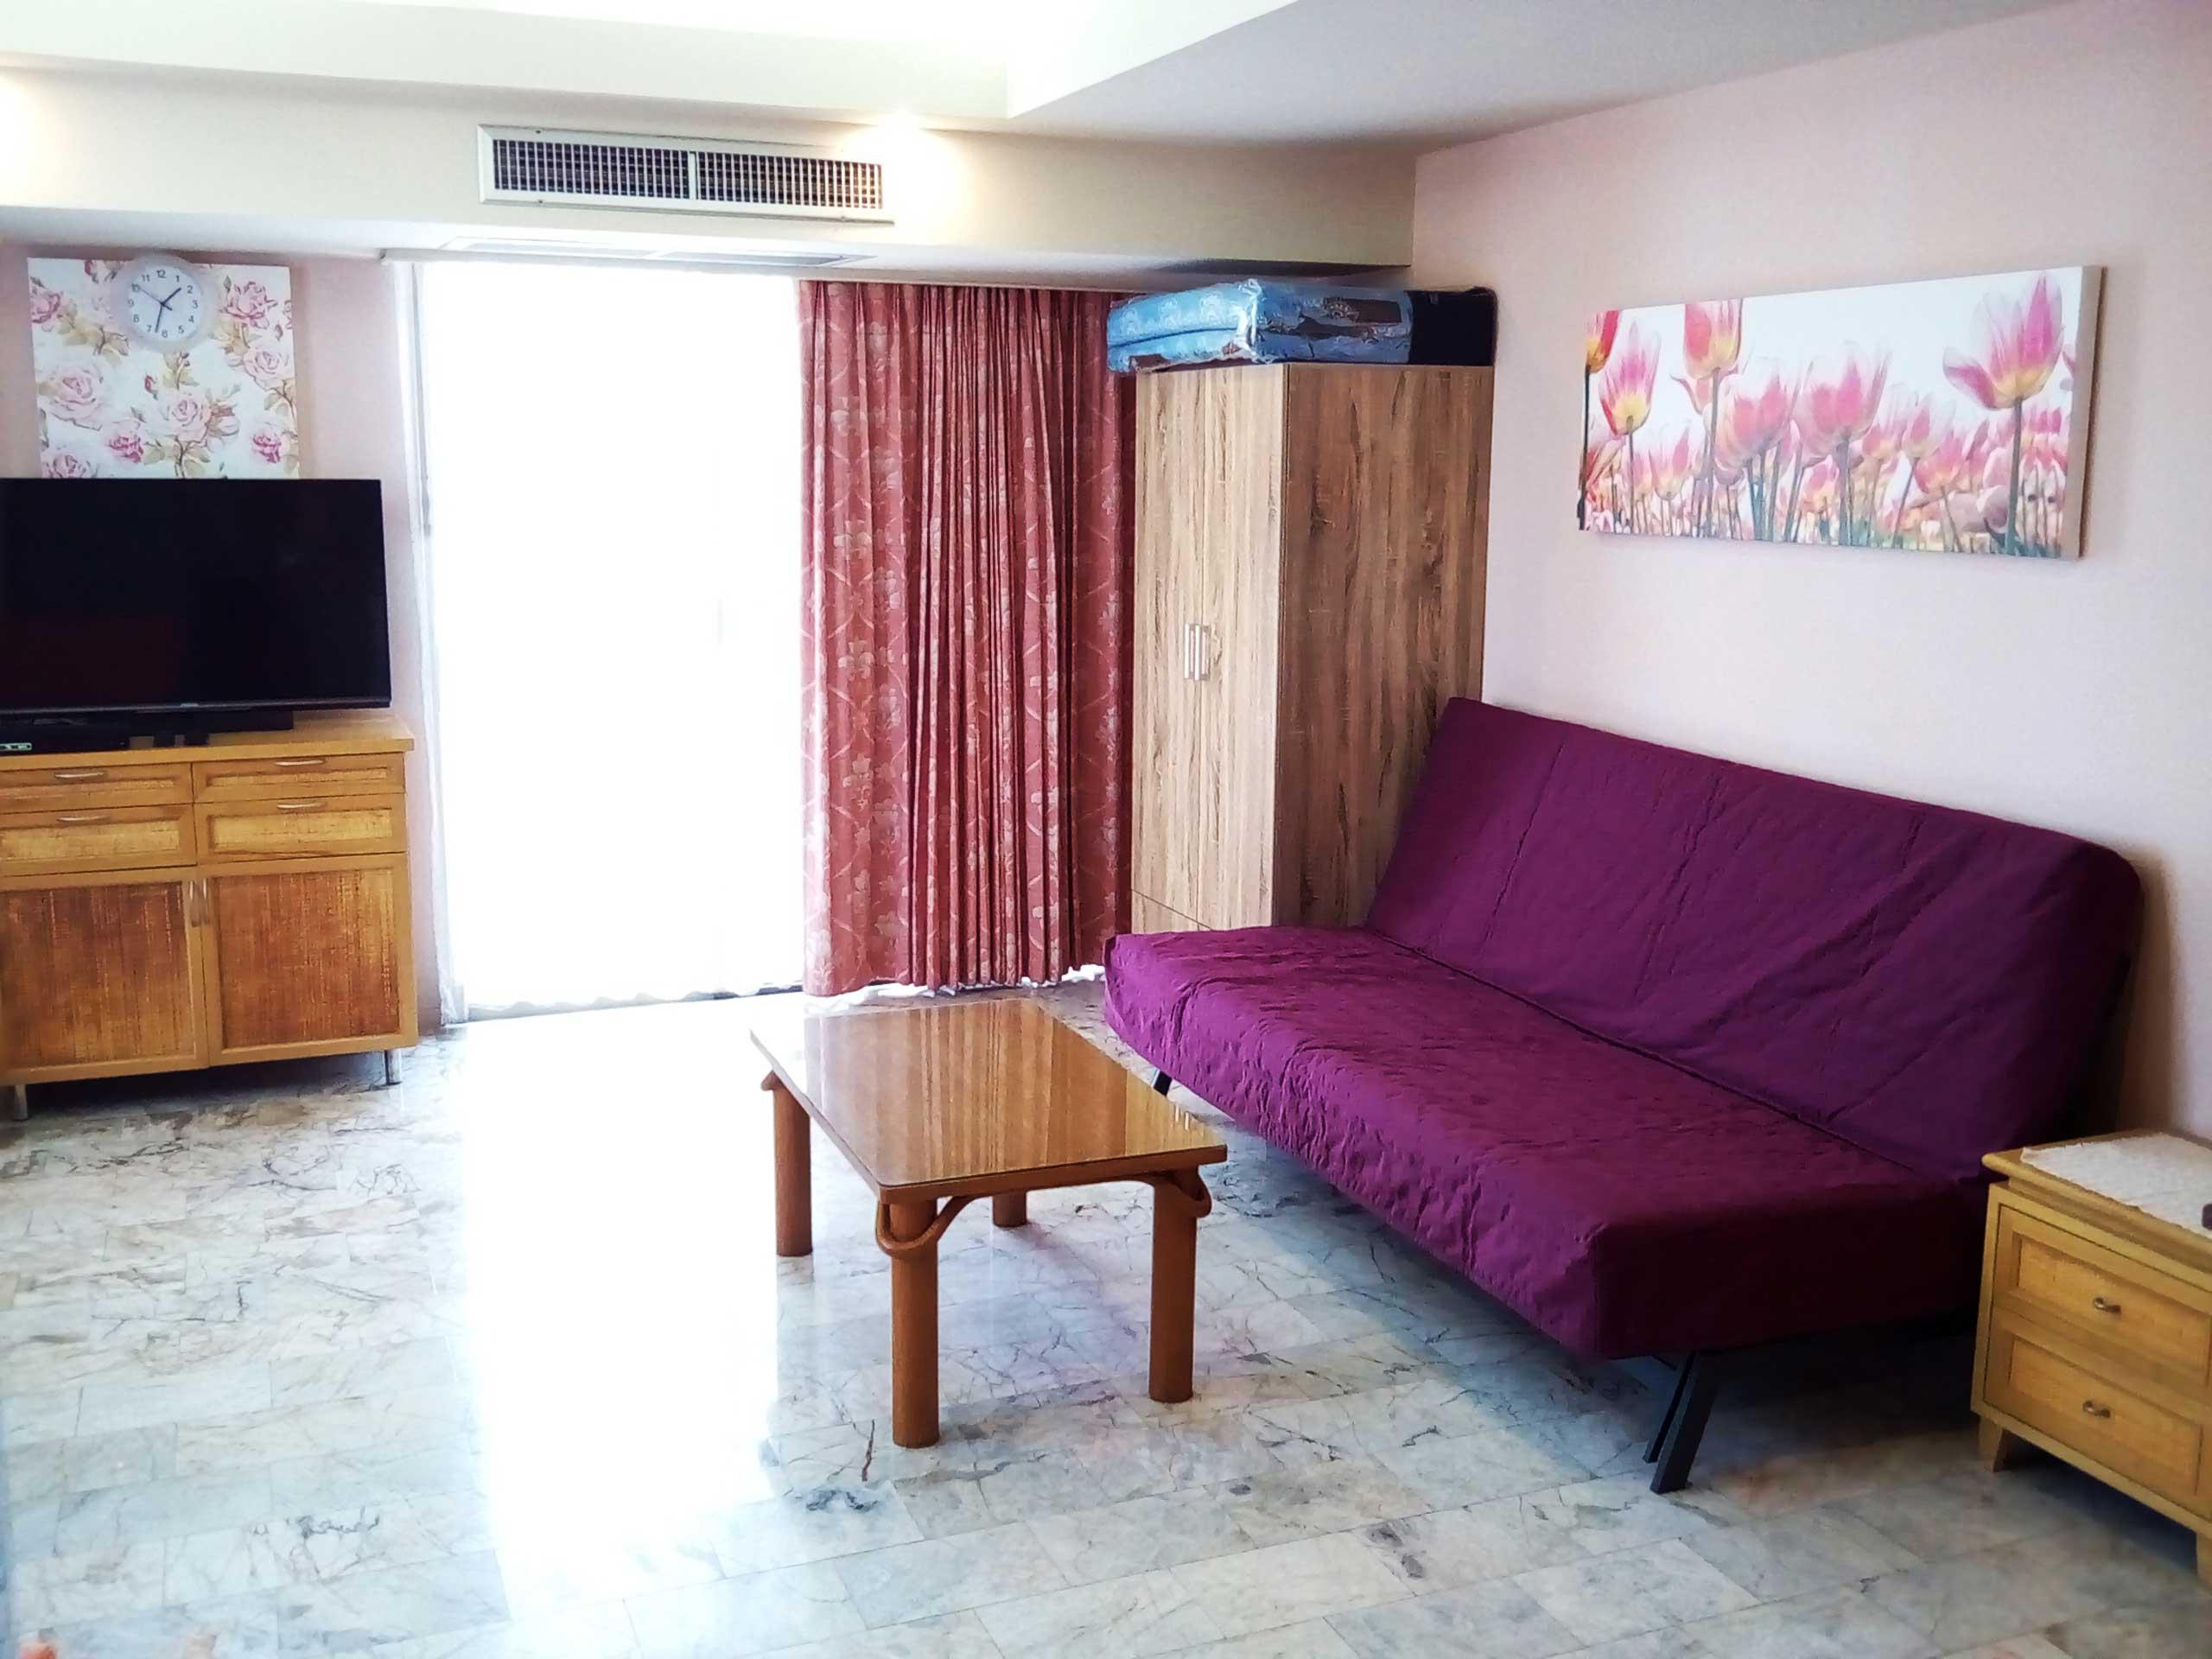 Продается квартира в Тайланде